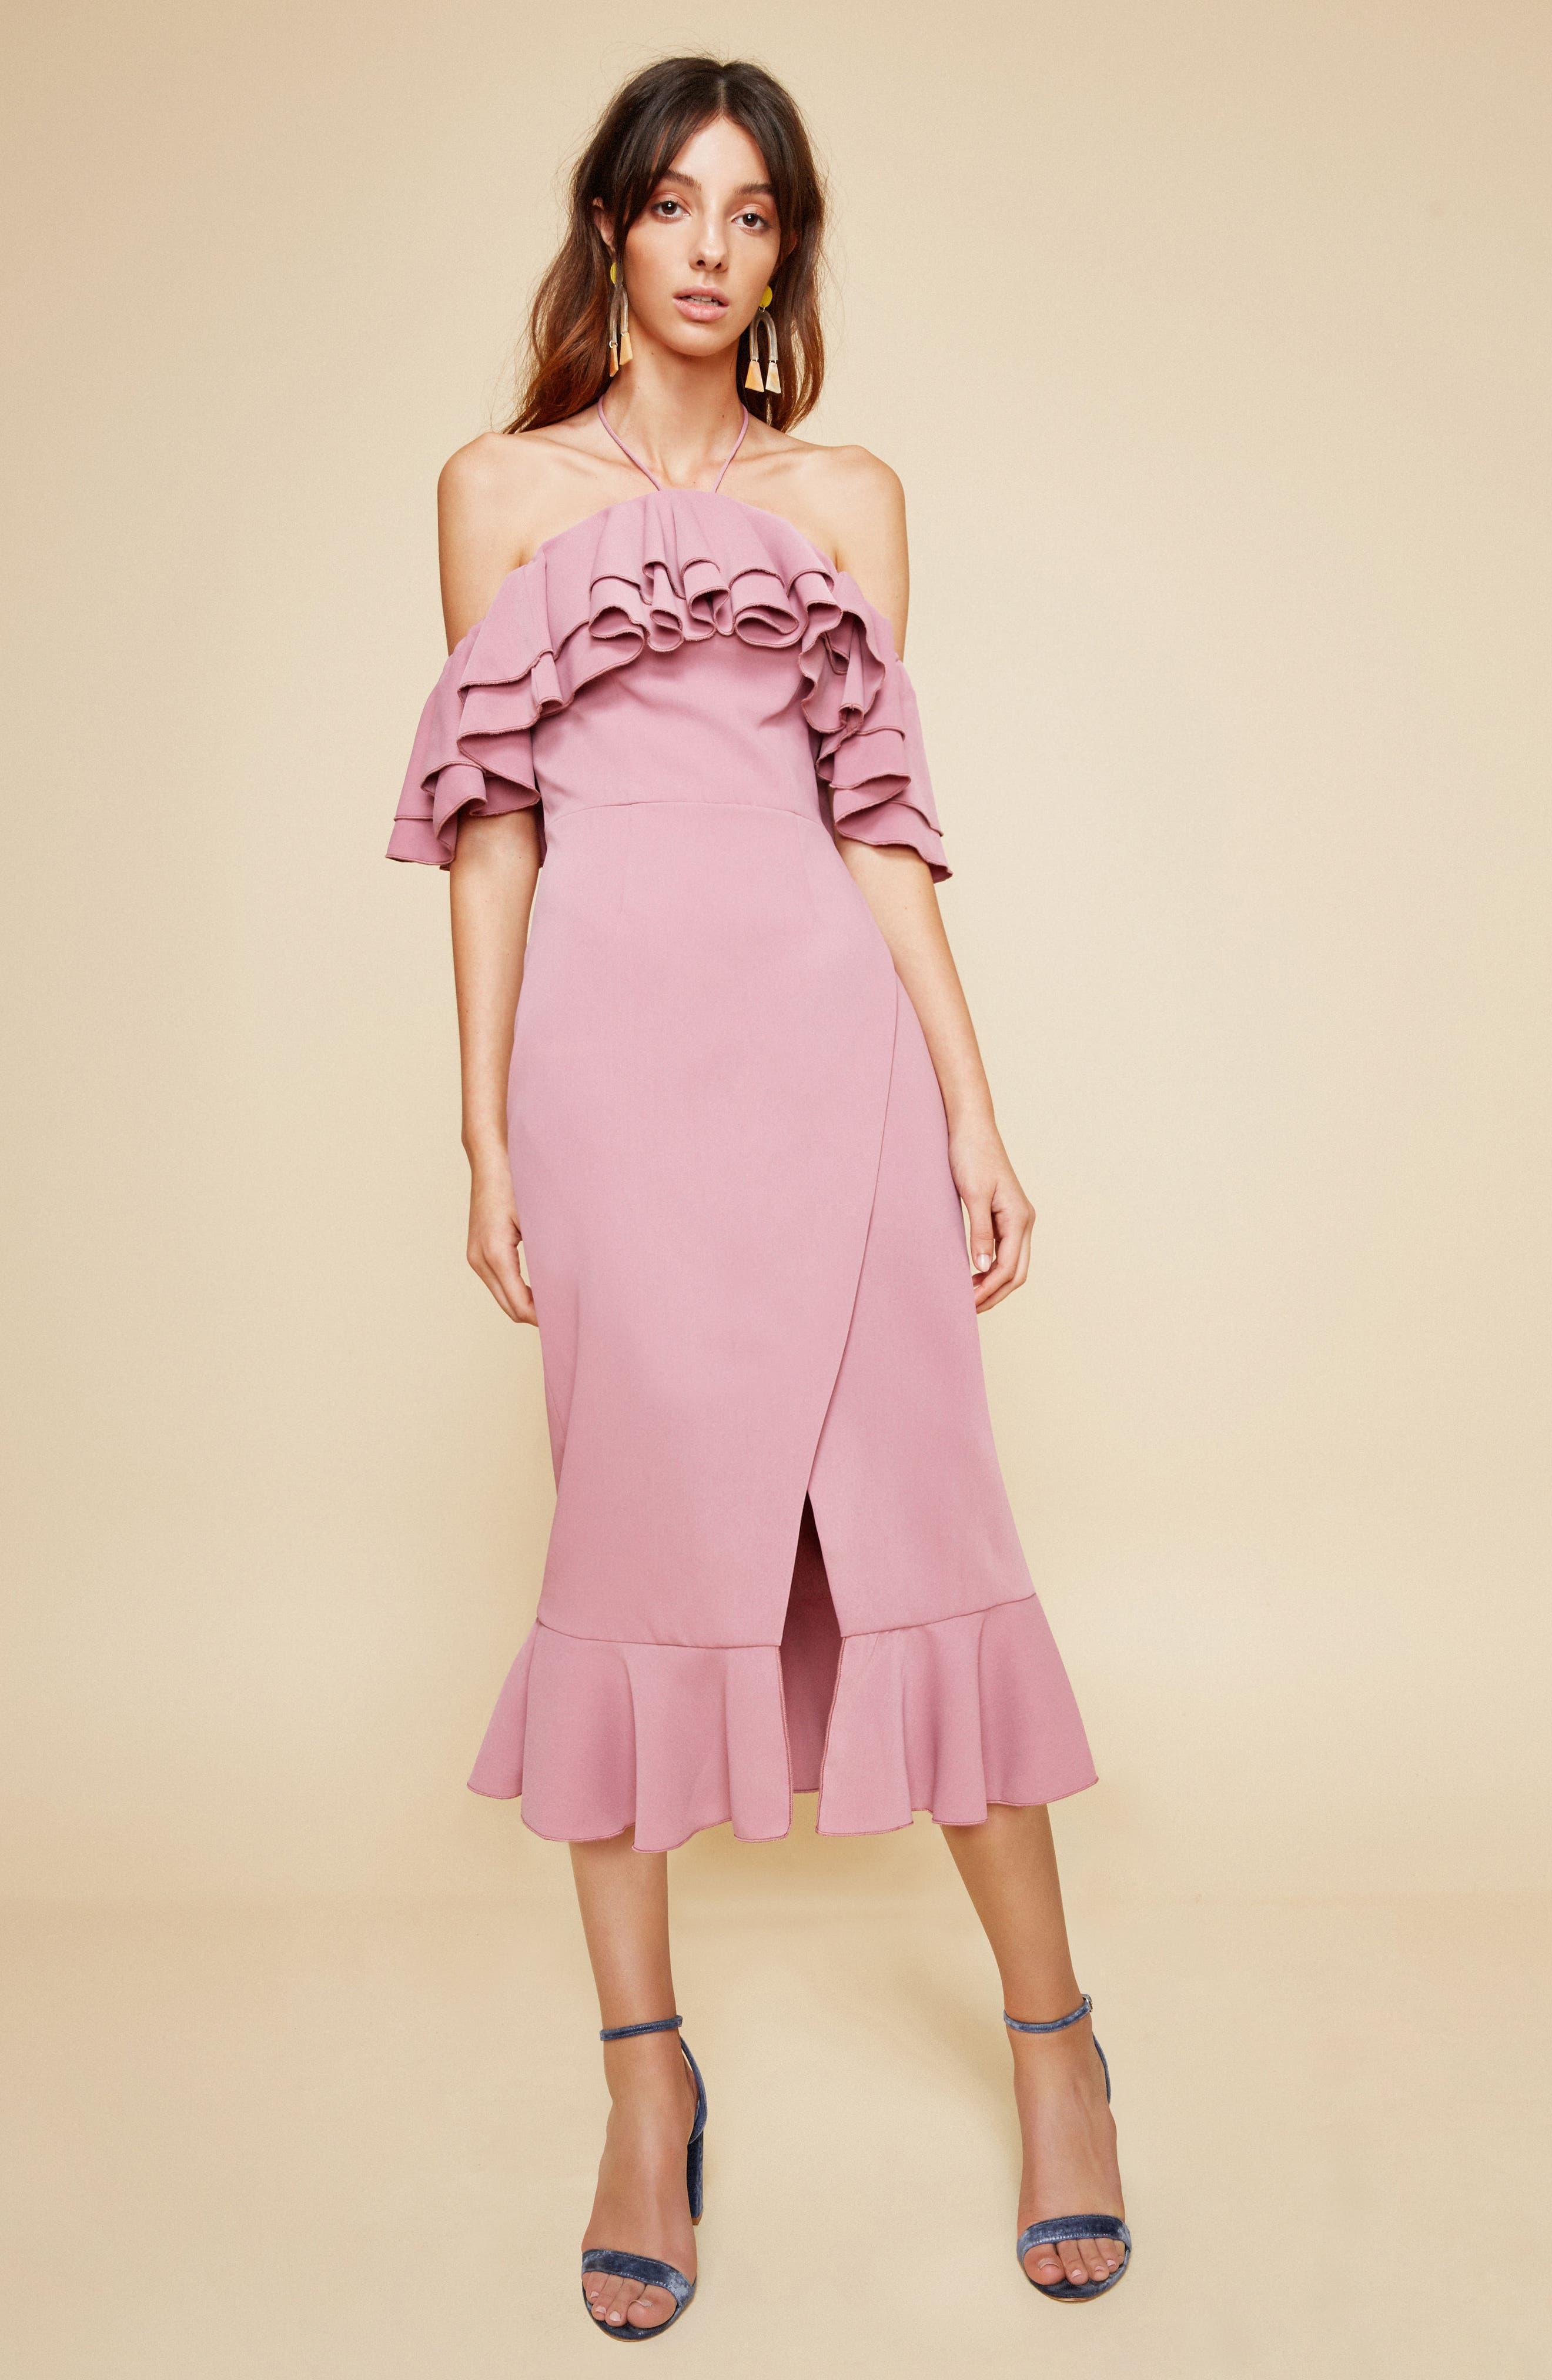 Temptation Ruffle Cold Shoulder Dress,                             Alternate thumbnail 8, color,